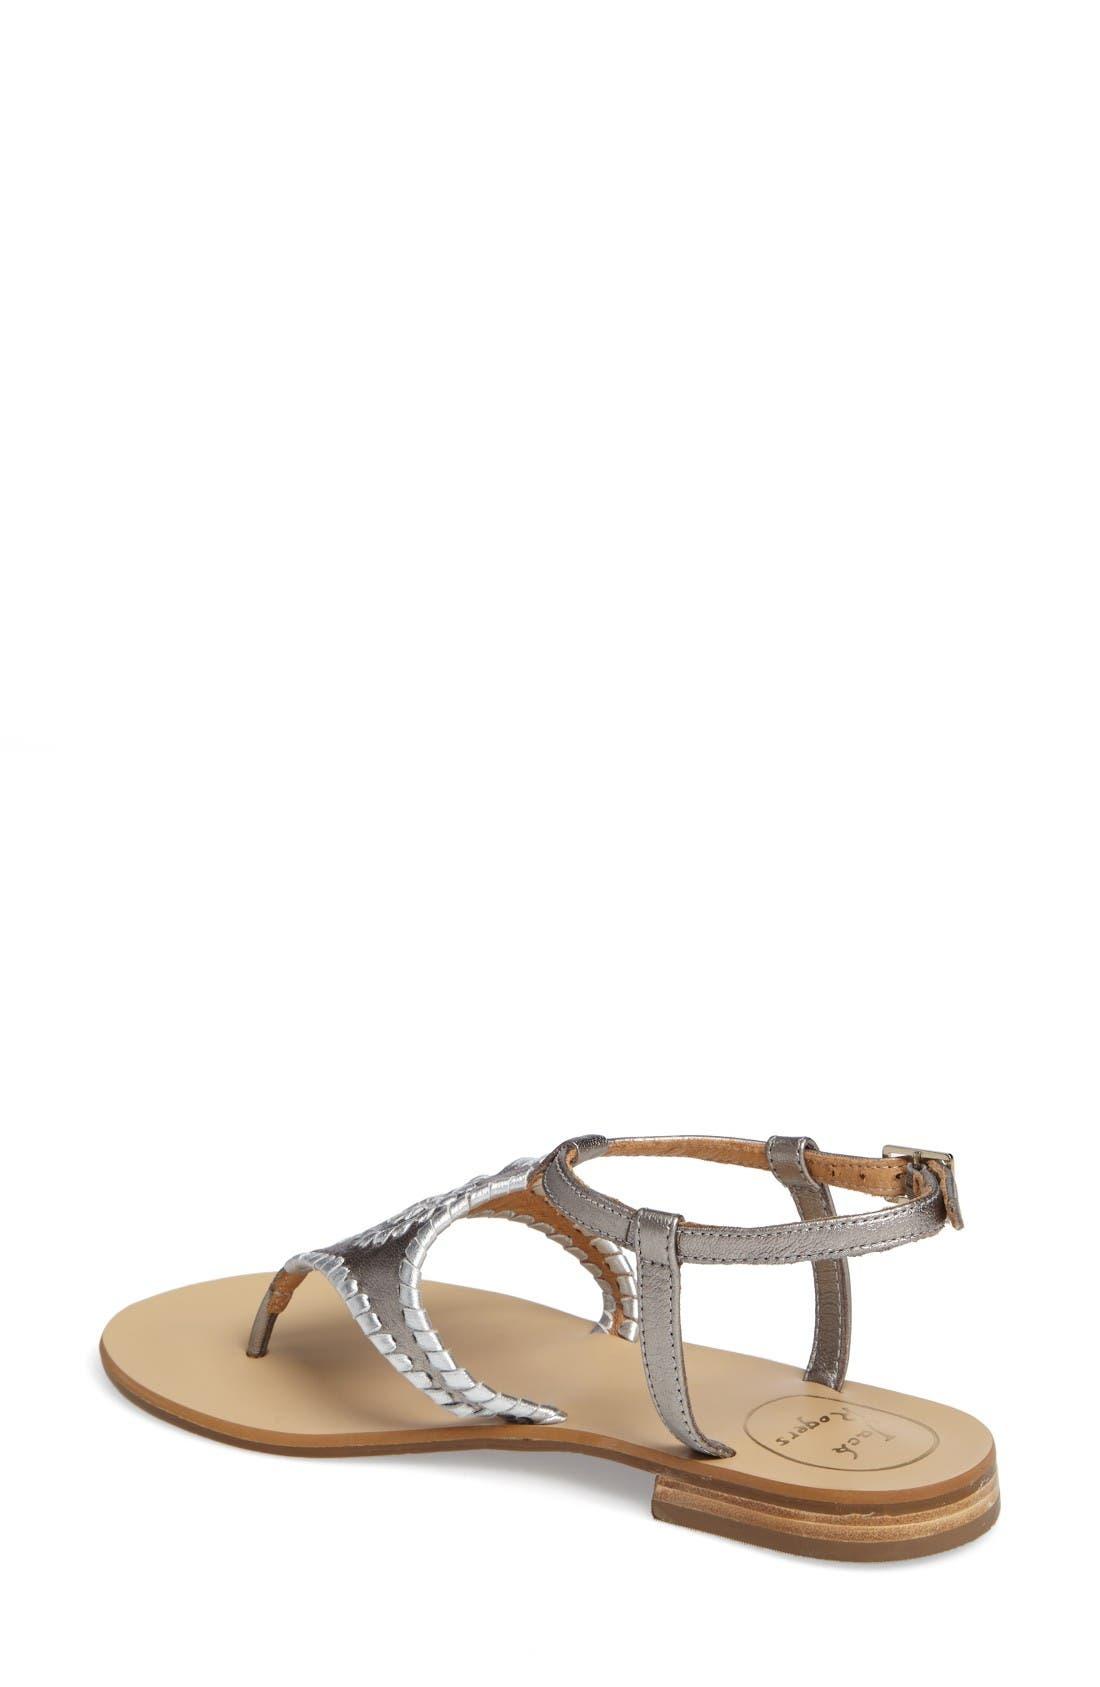 Alternate Image 2  - Jack Rogers 'Maci' Flat Sandal (Women)